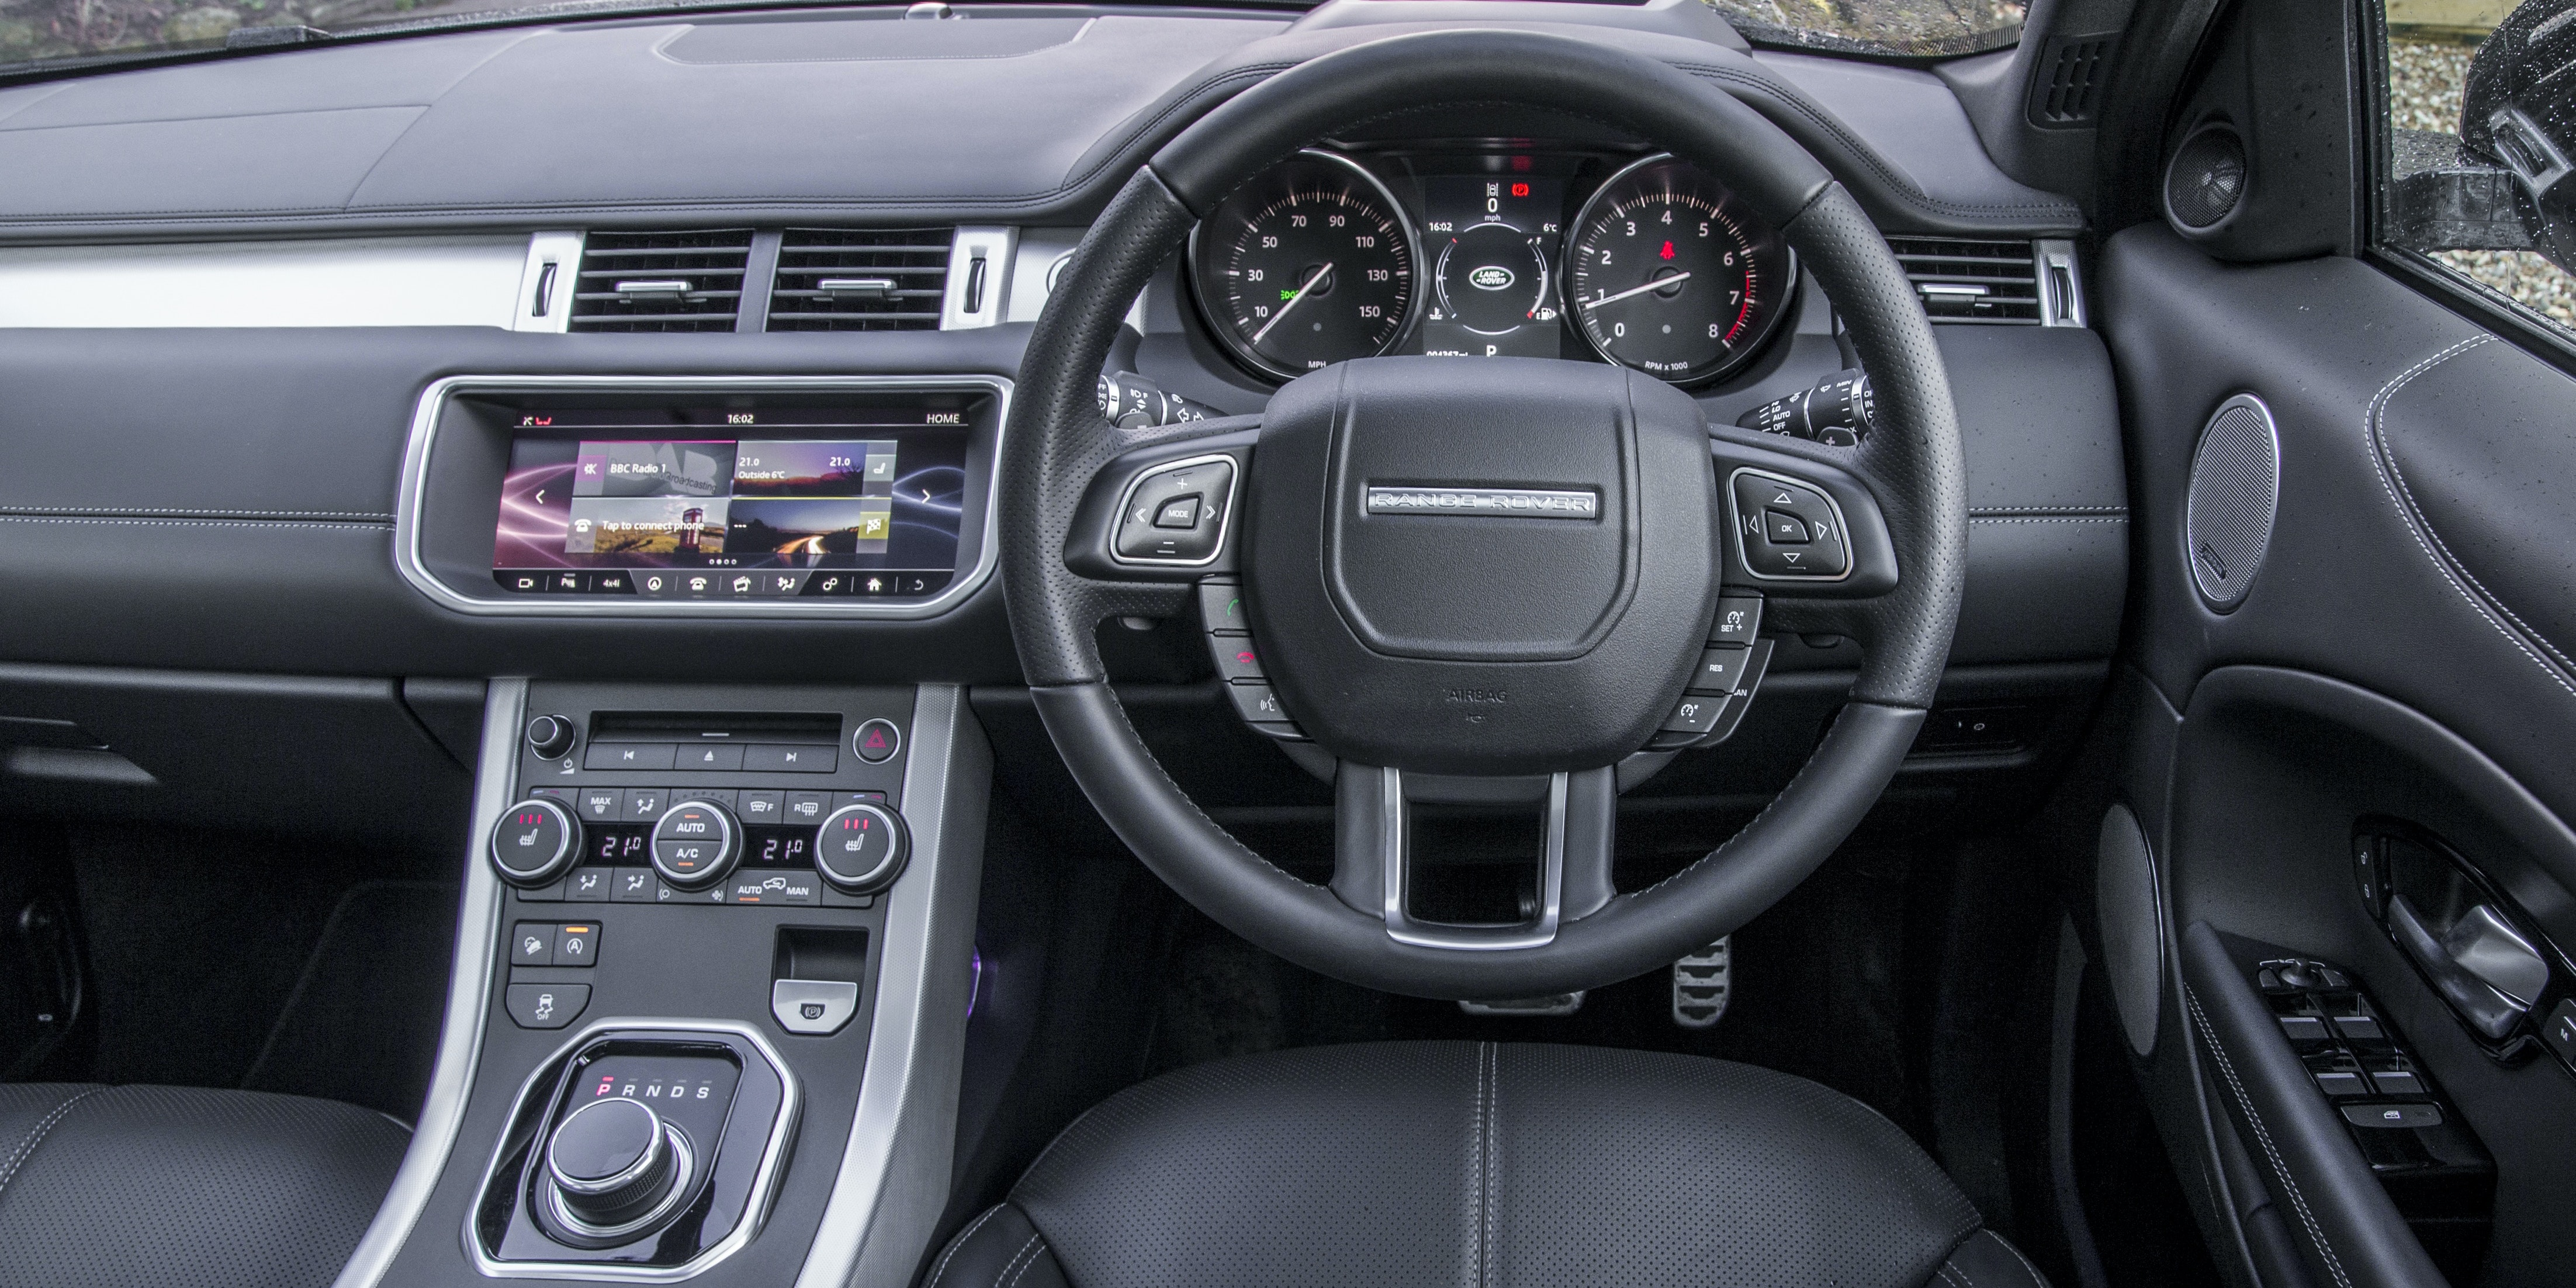 Land Rover Range Rover Evoque 2015 2018 Interior Infotainment